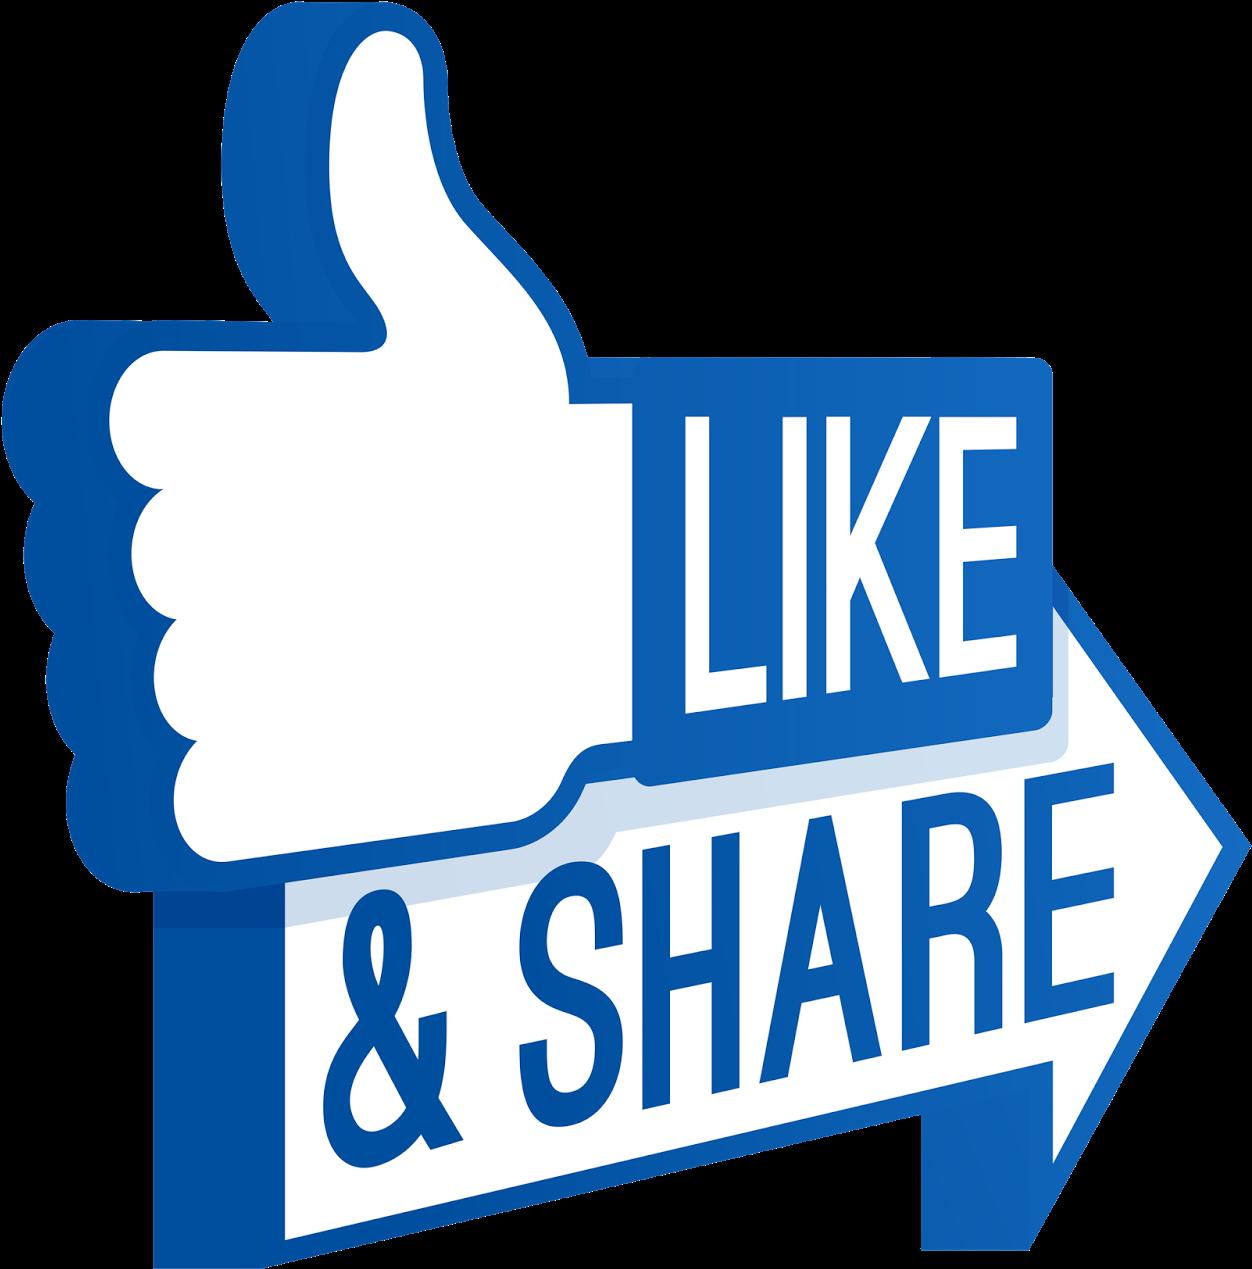 Clip Art Clip Art For Facebook.